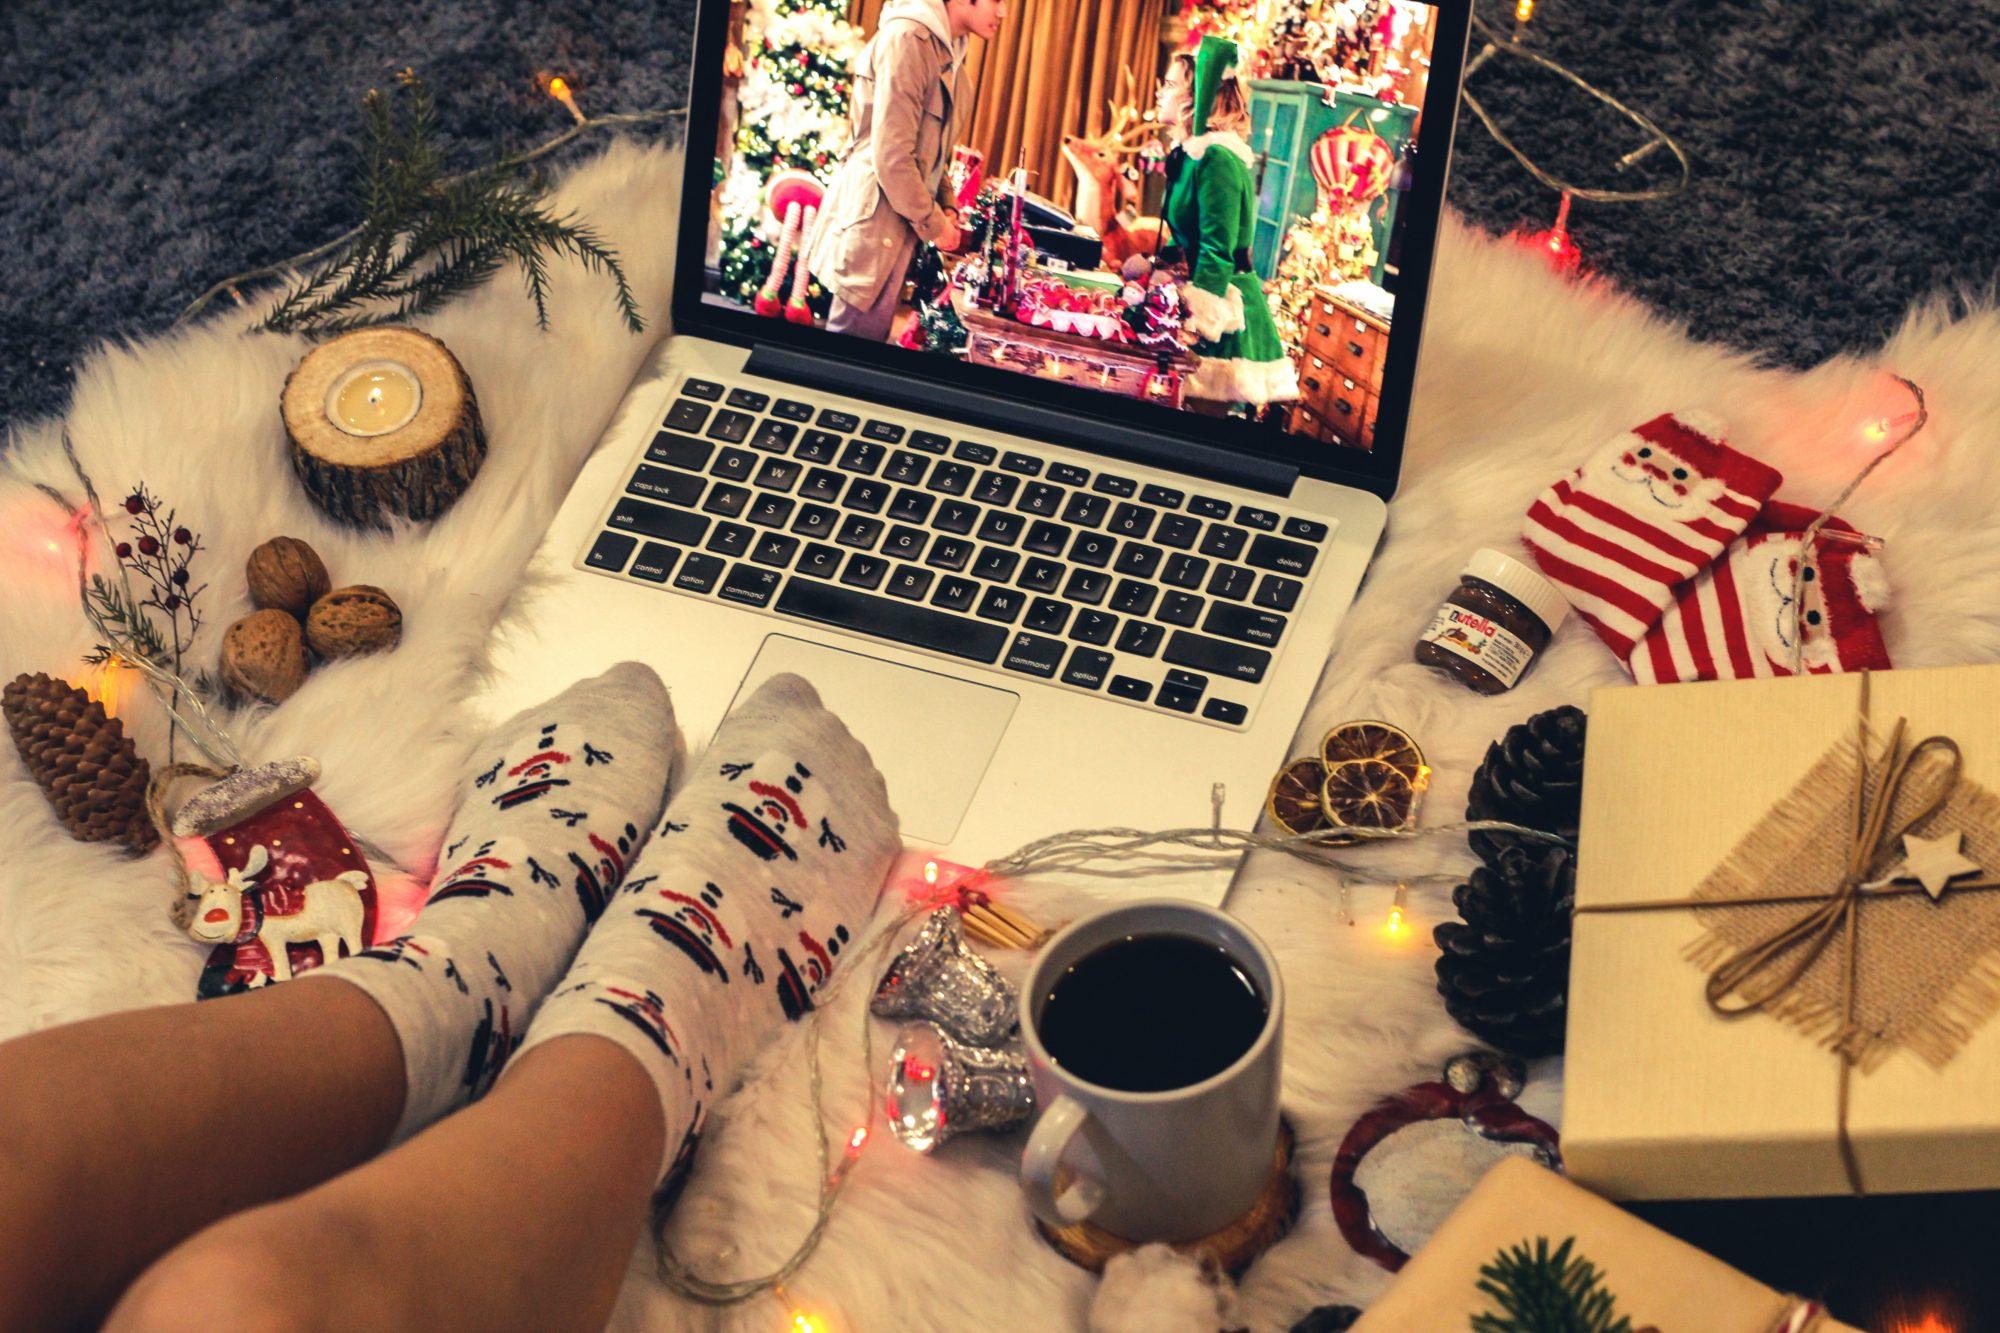 holiday spirit pajamas wfh socks mood positivity cozy comfy